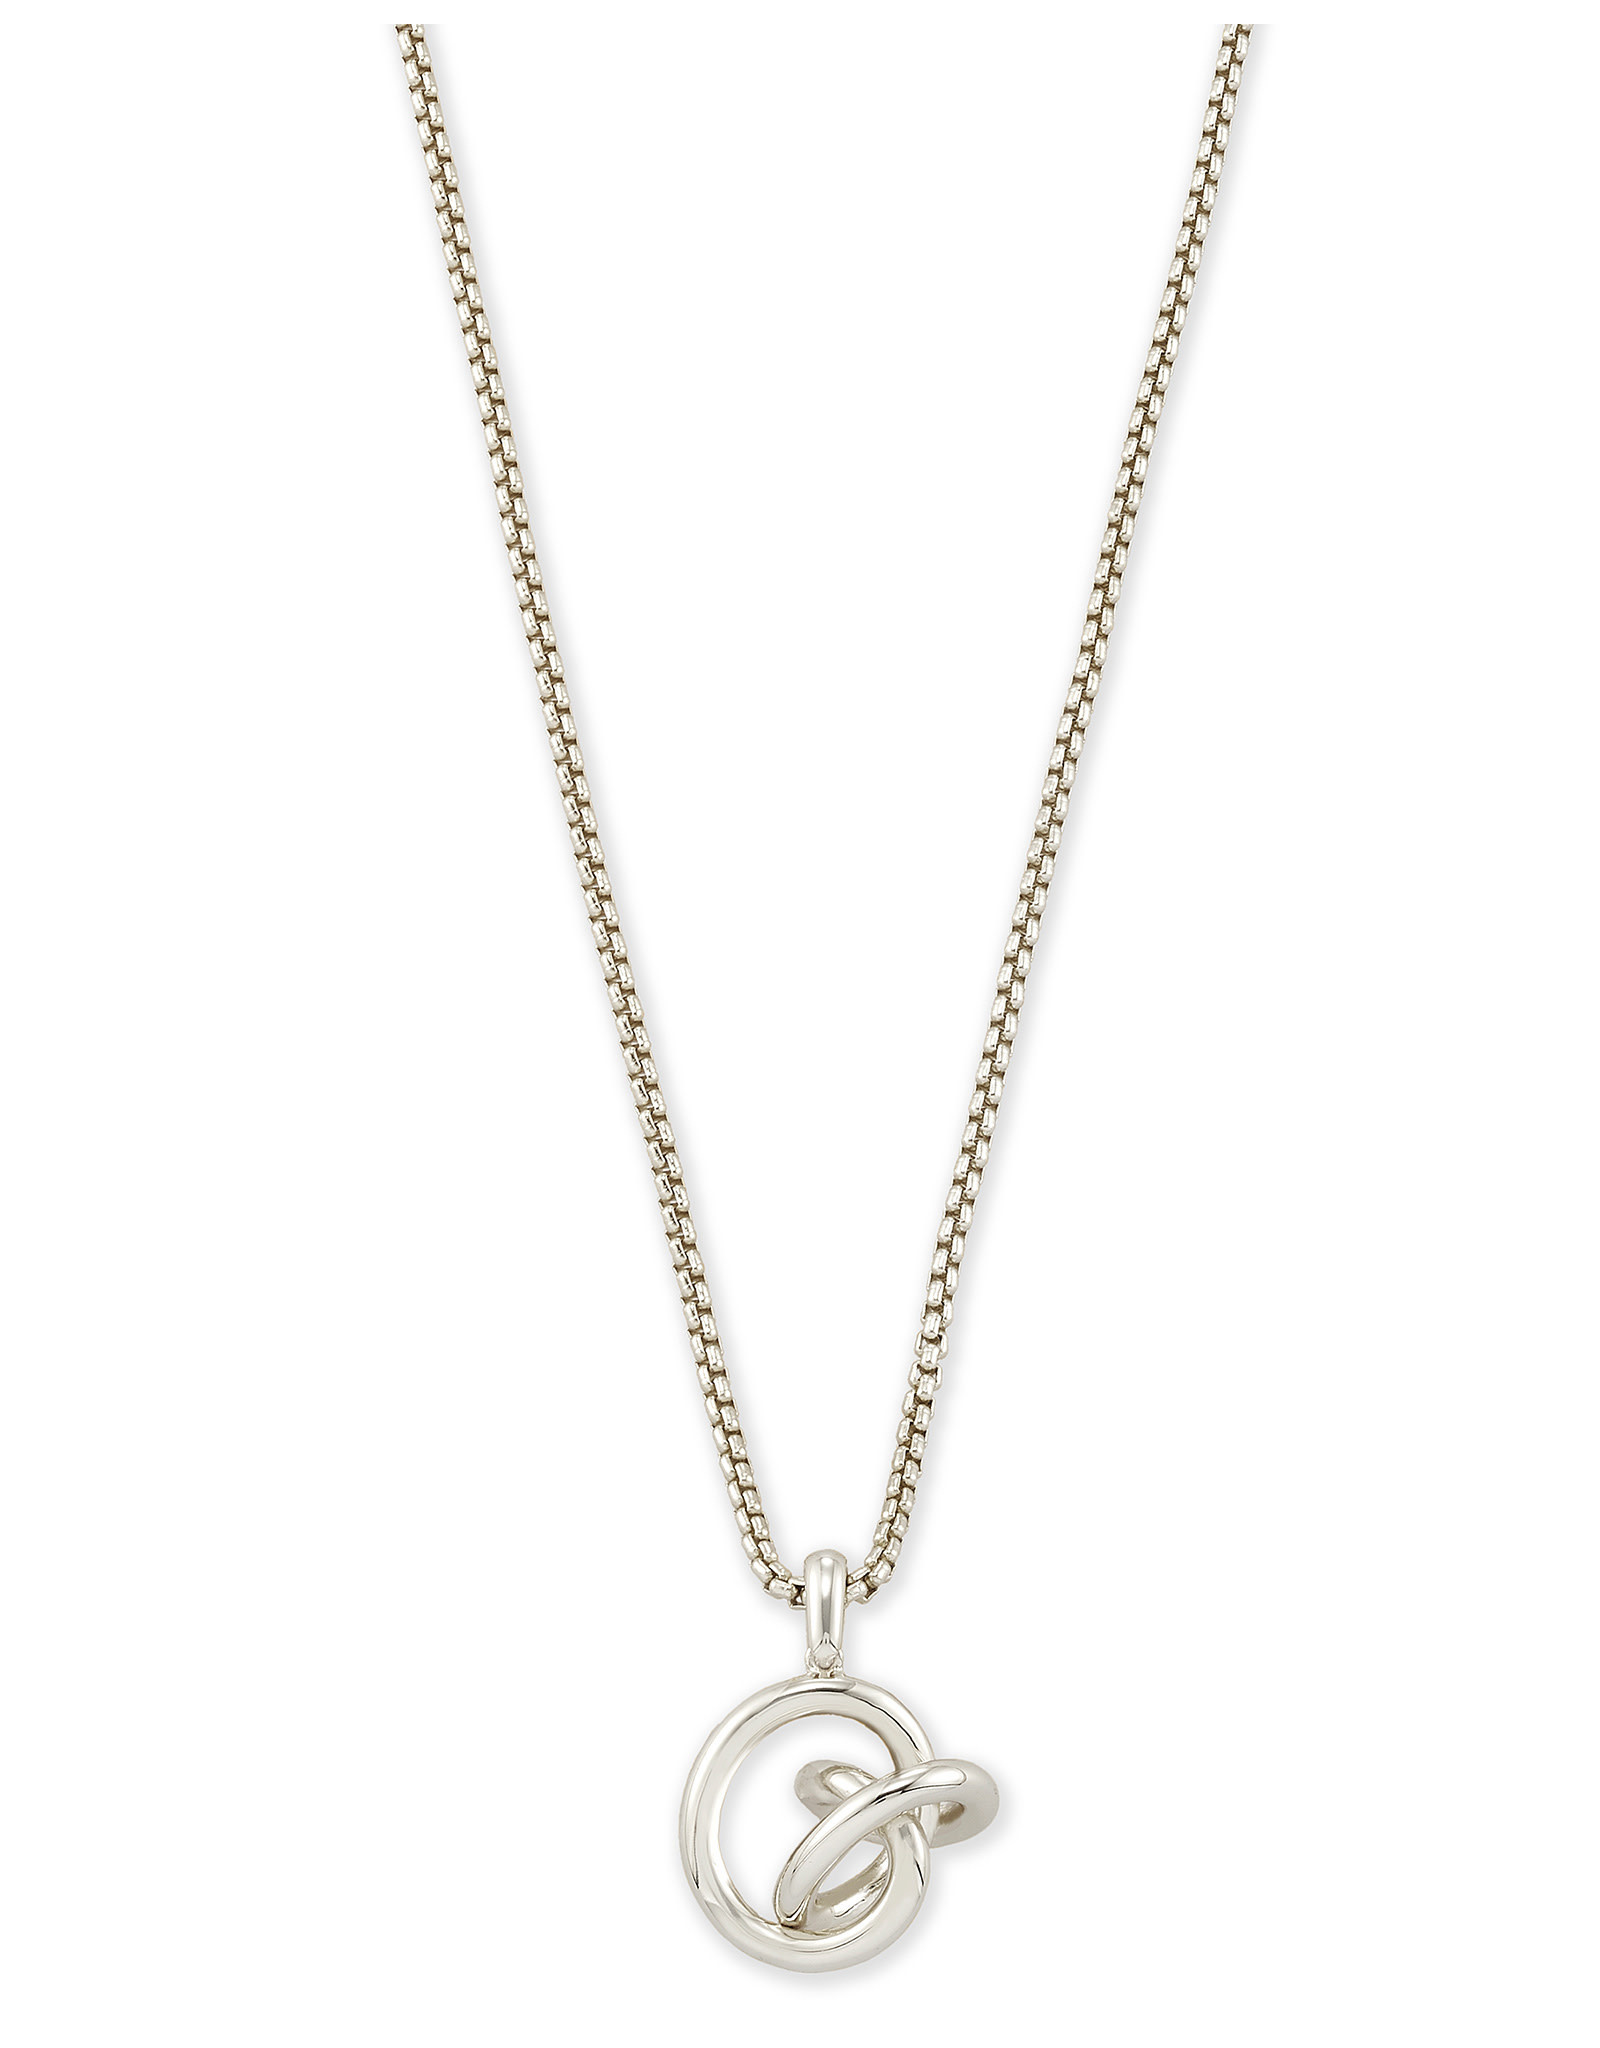 Kendra Scott Presleigh SM Long Pendant in Silver